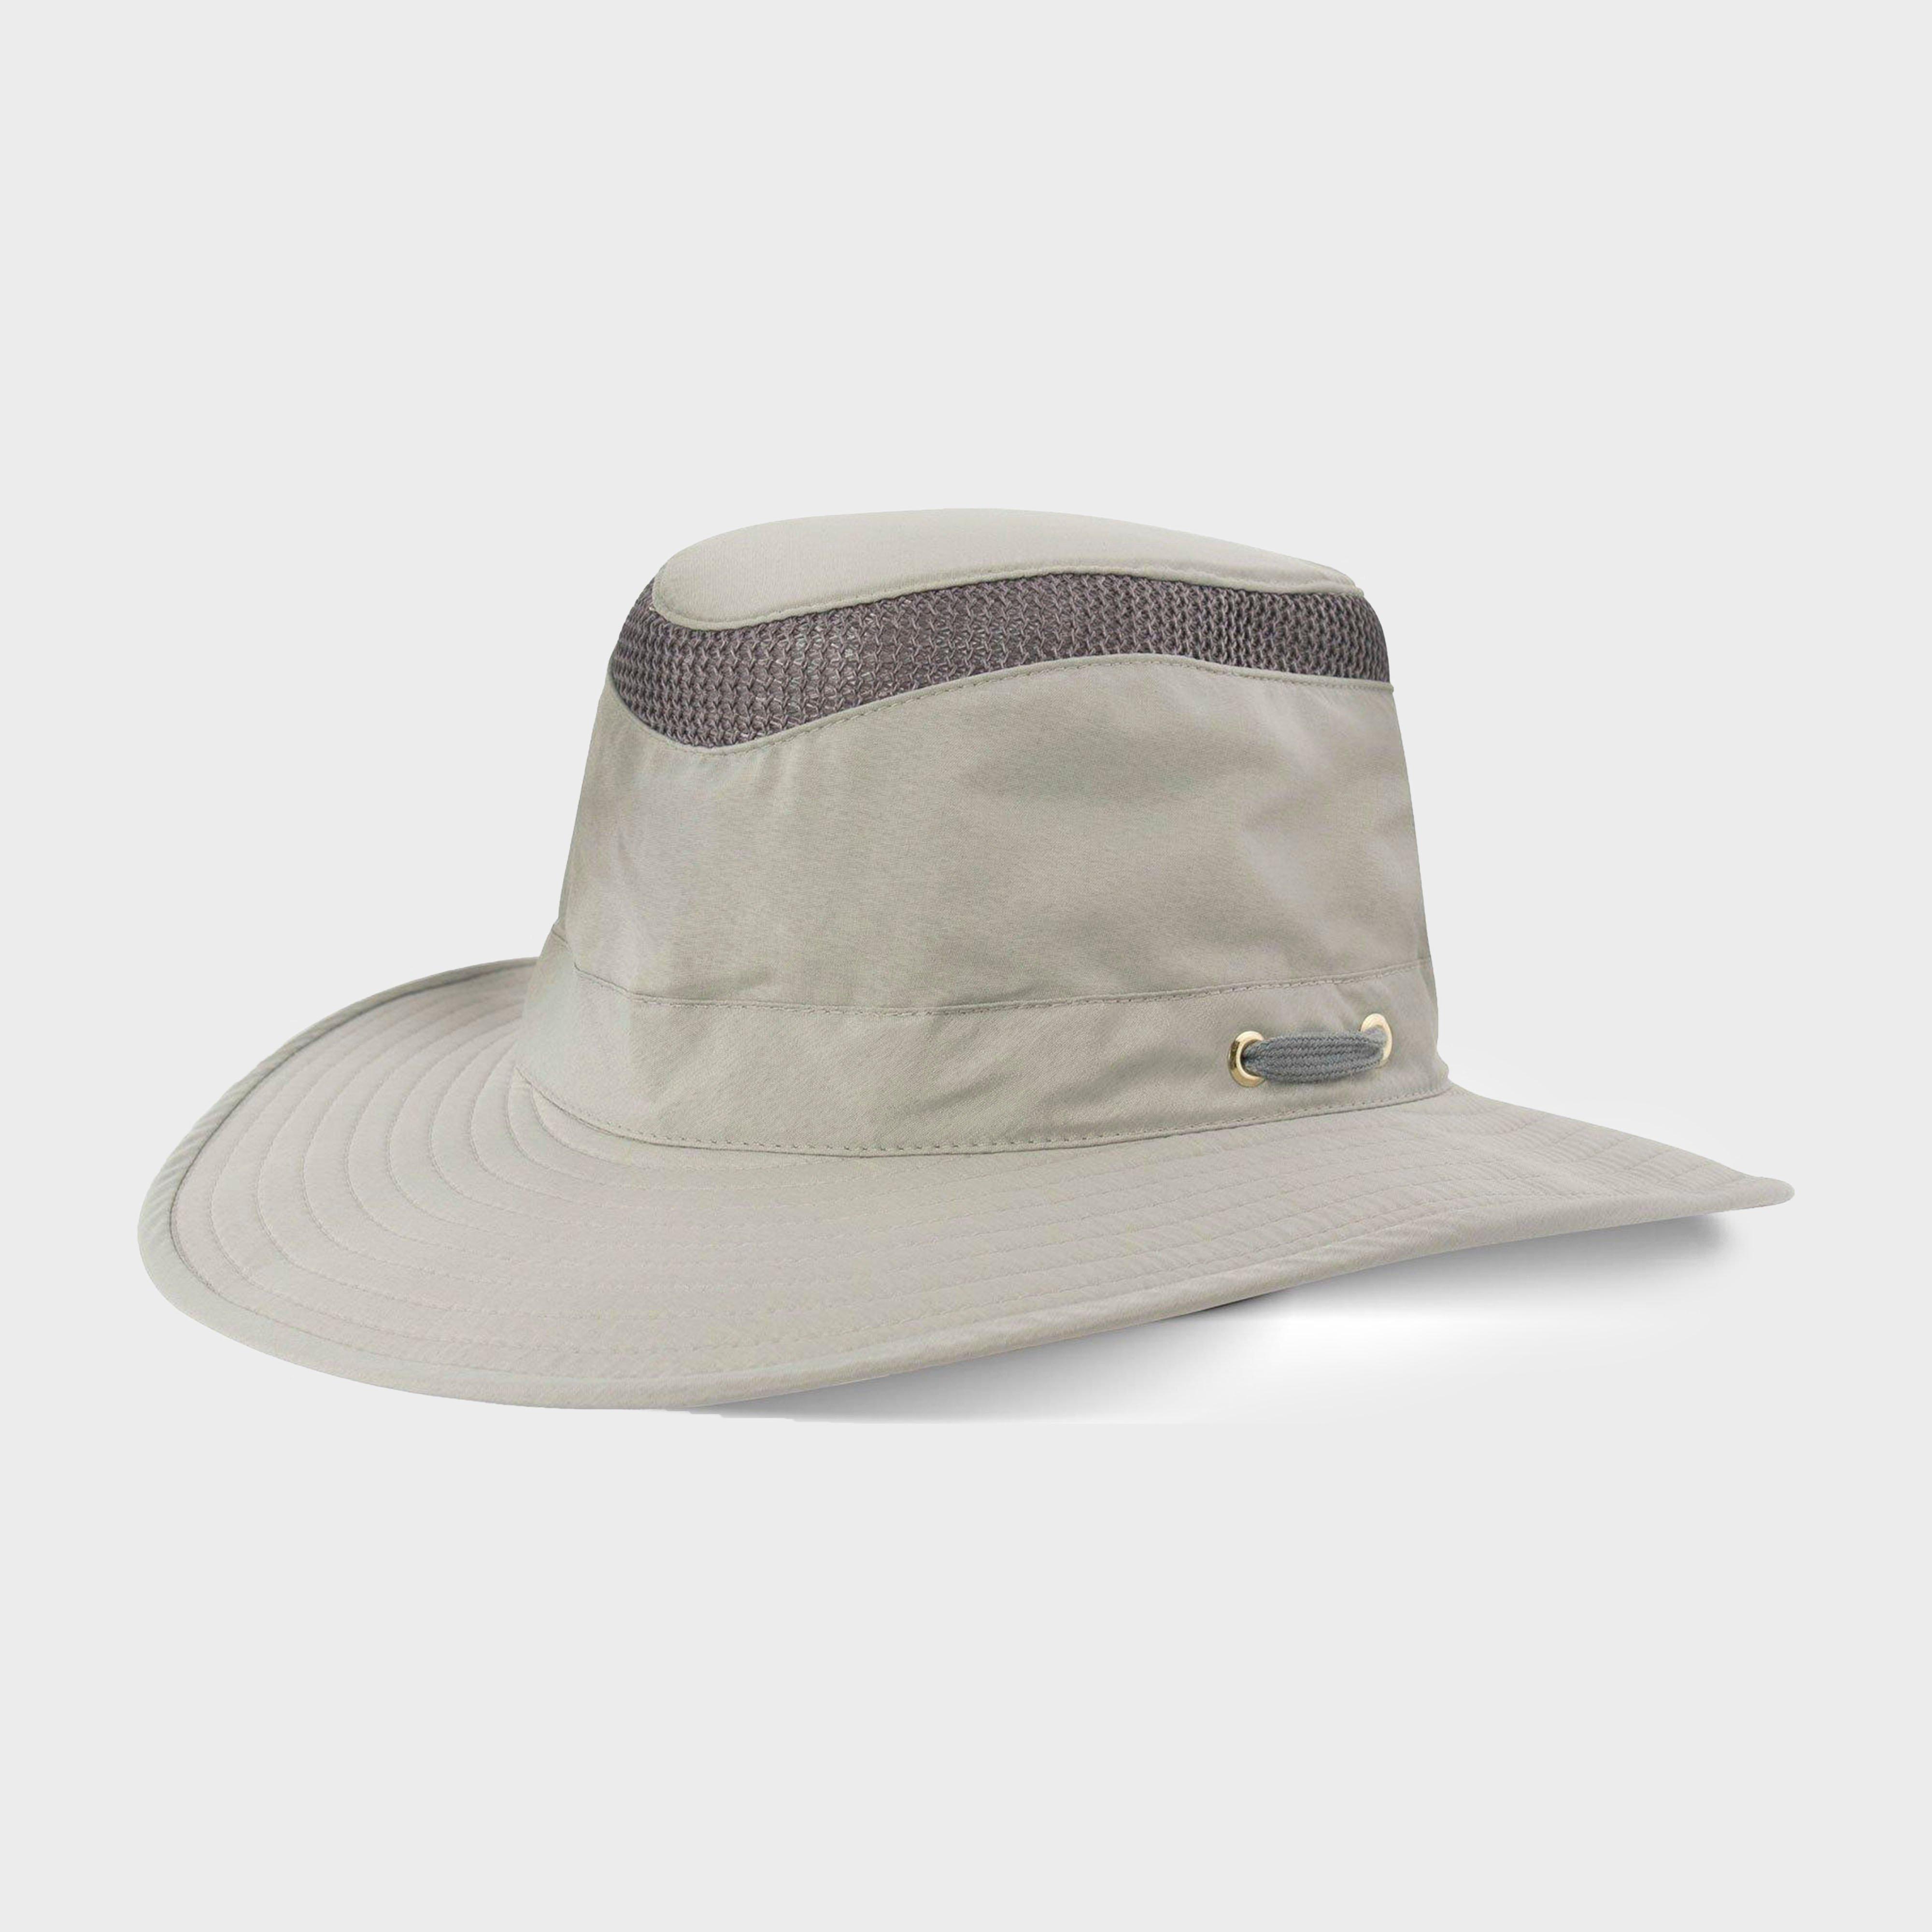 Tilley Ltm6 Unisex Broad Airflo Hat - Grey/Brim, Grey